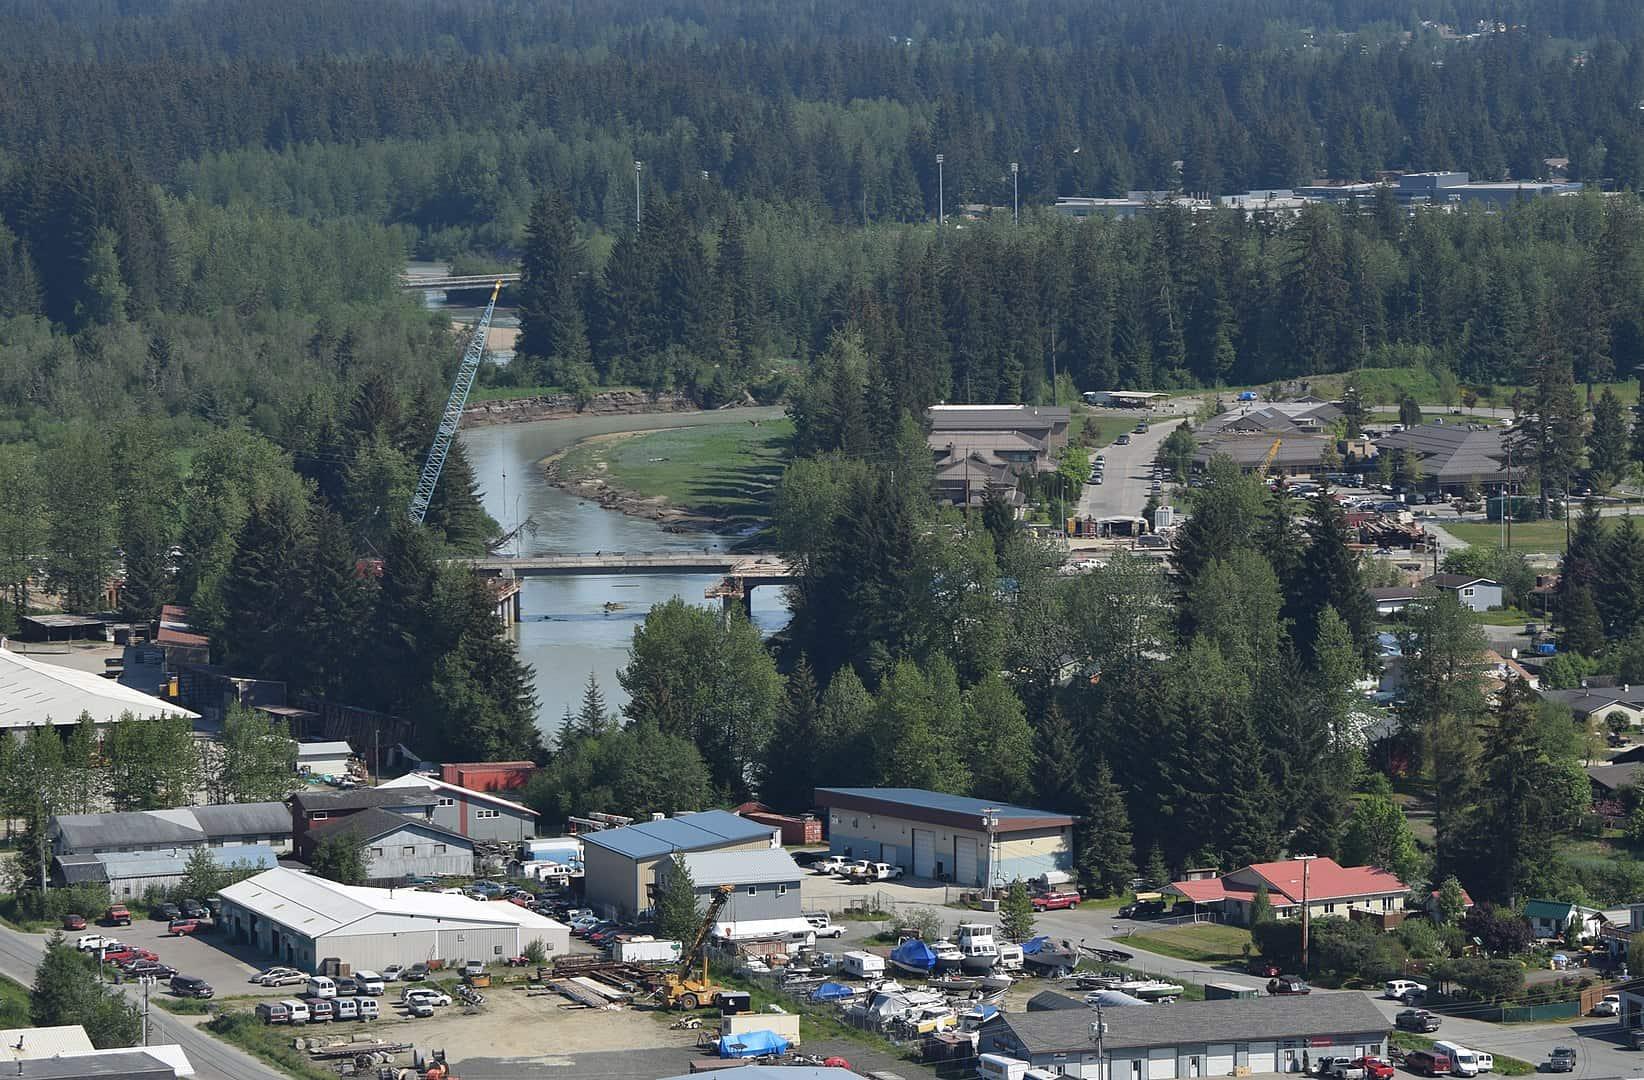 Elizabeth Peratrovich, Juneau Brotherhood Bridge